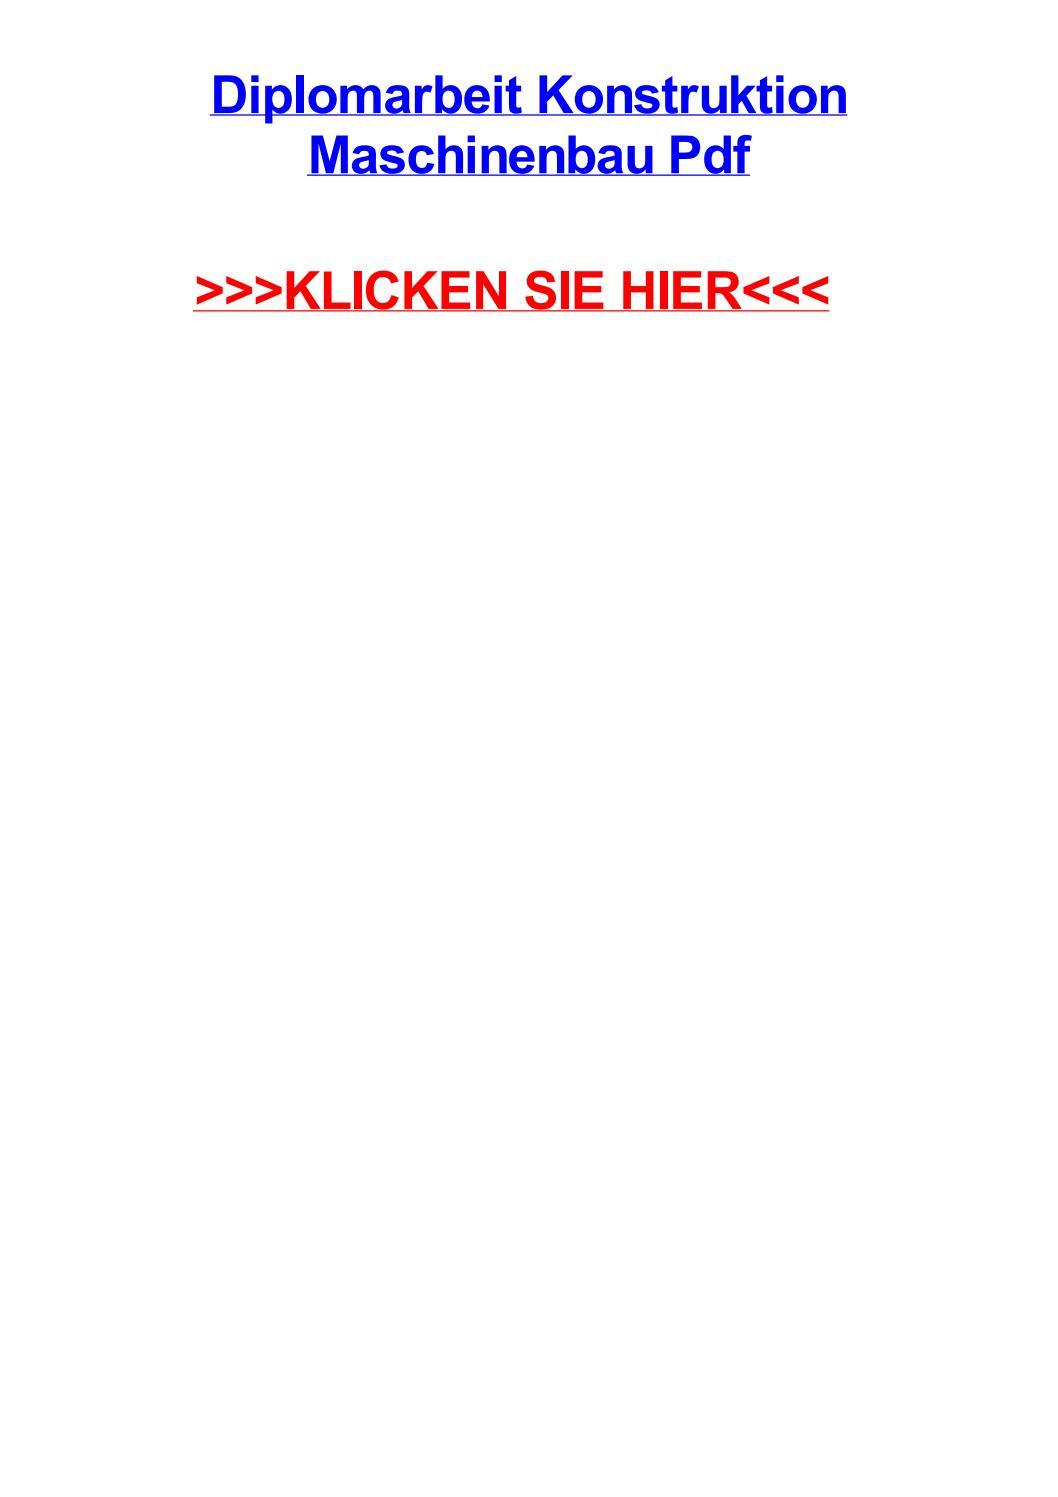 Diplomarbeit konstruktion maschinenbau pdf by cynthiaberzw - issuu